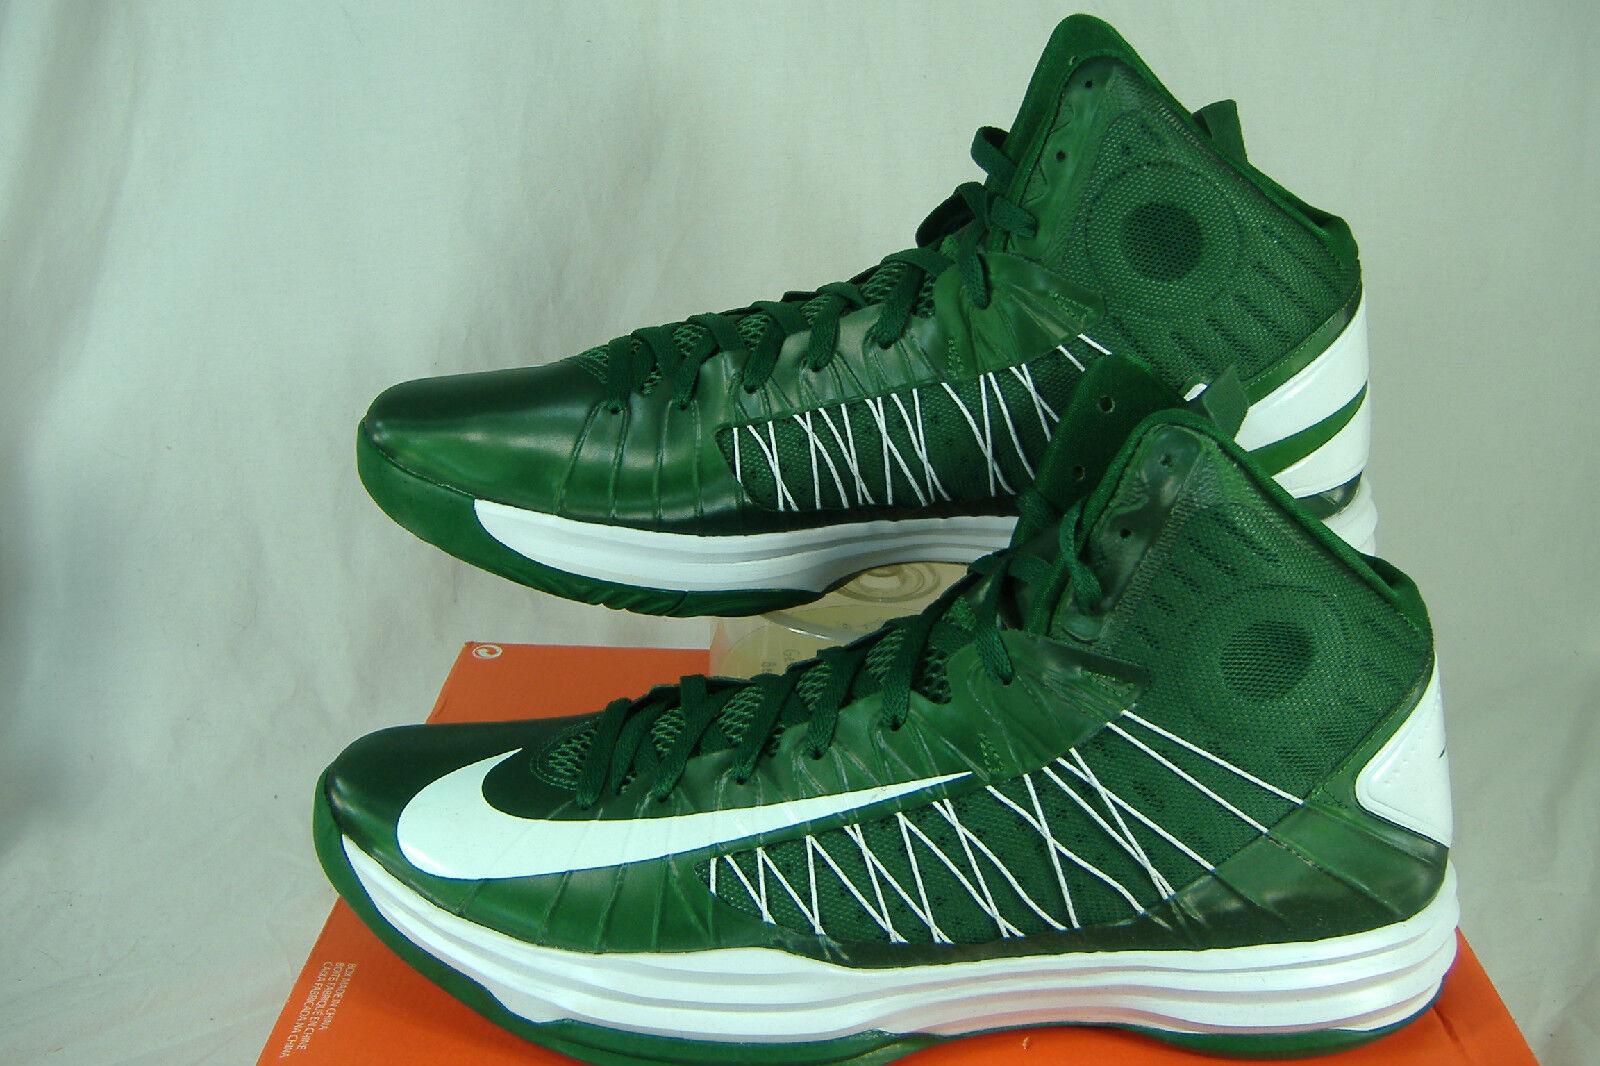 Nuevo Mens 16.5 NIKE Hyperdunk TB verde blancoo alta Top zapatos  140 524882 -300